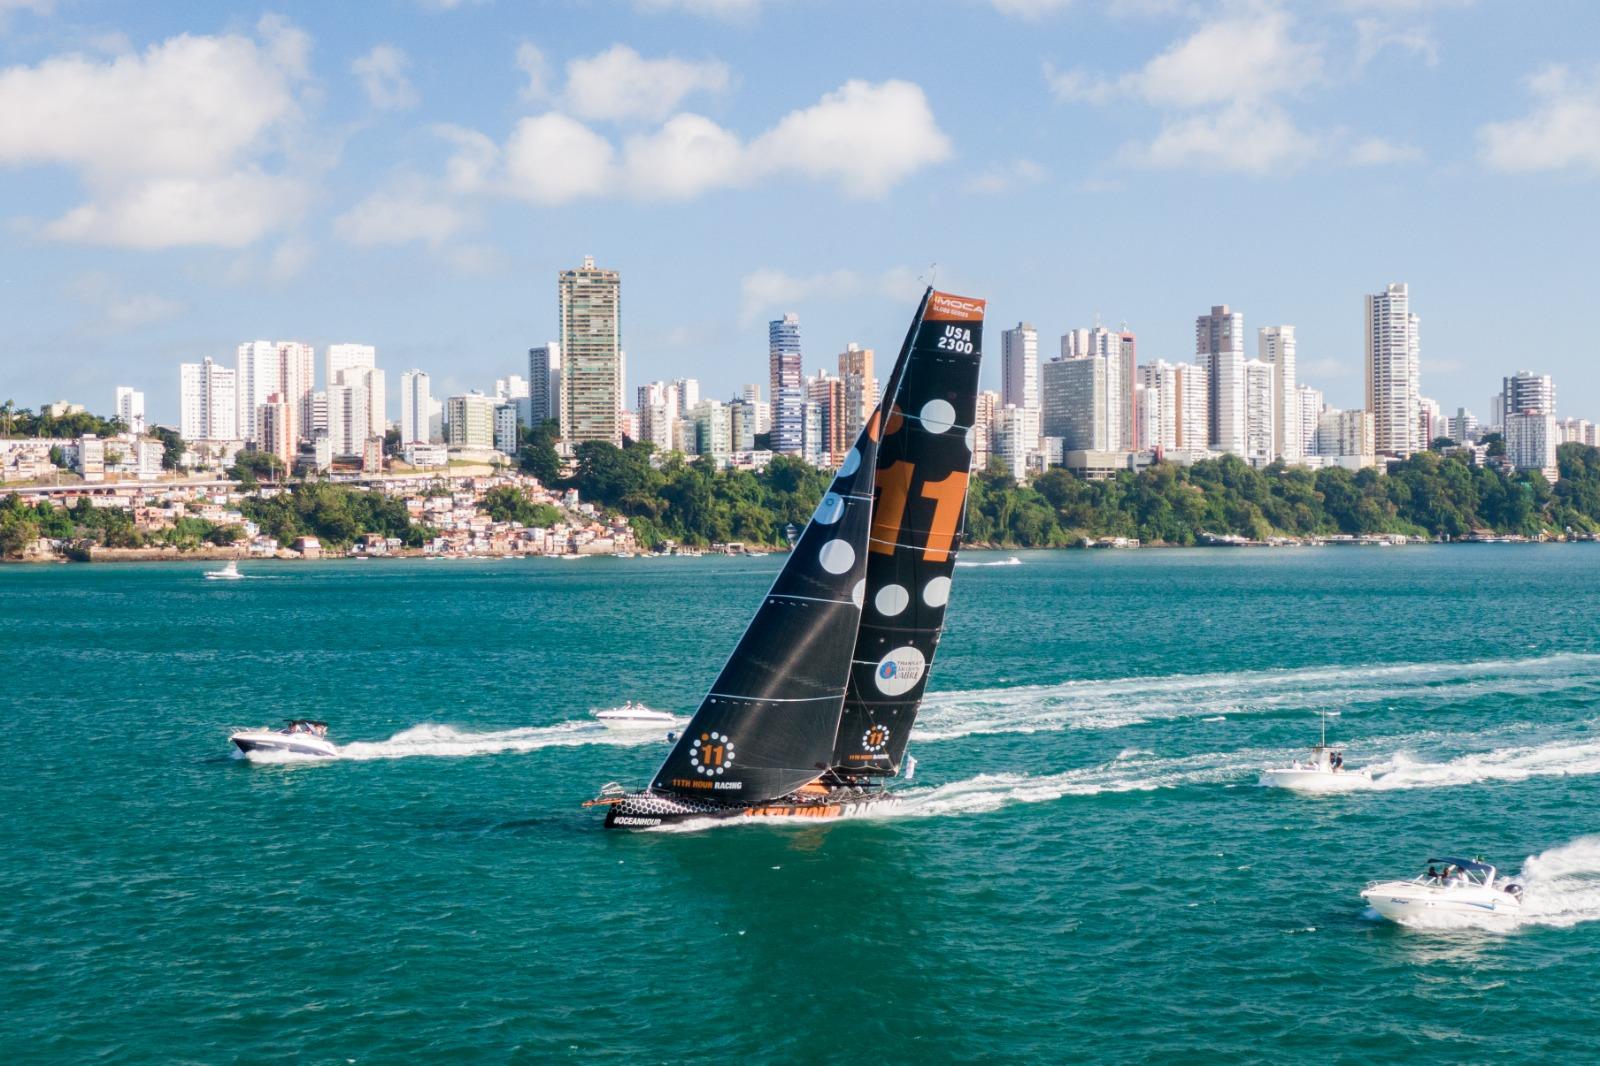 11th Hour Racing Team Finish 5th in Transat Jacques Vabre in Salvador De Bahia Brazil